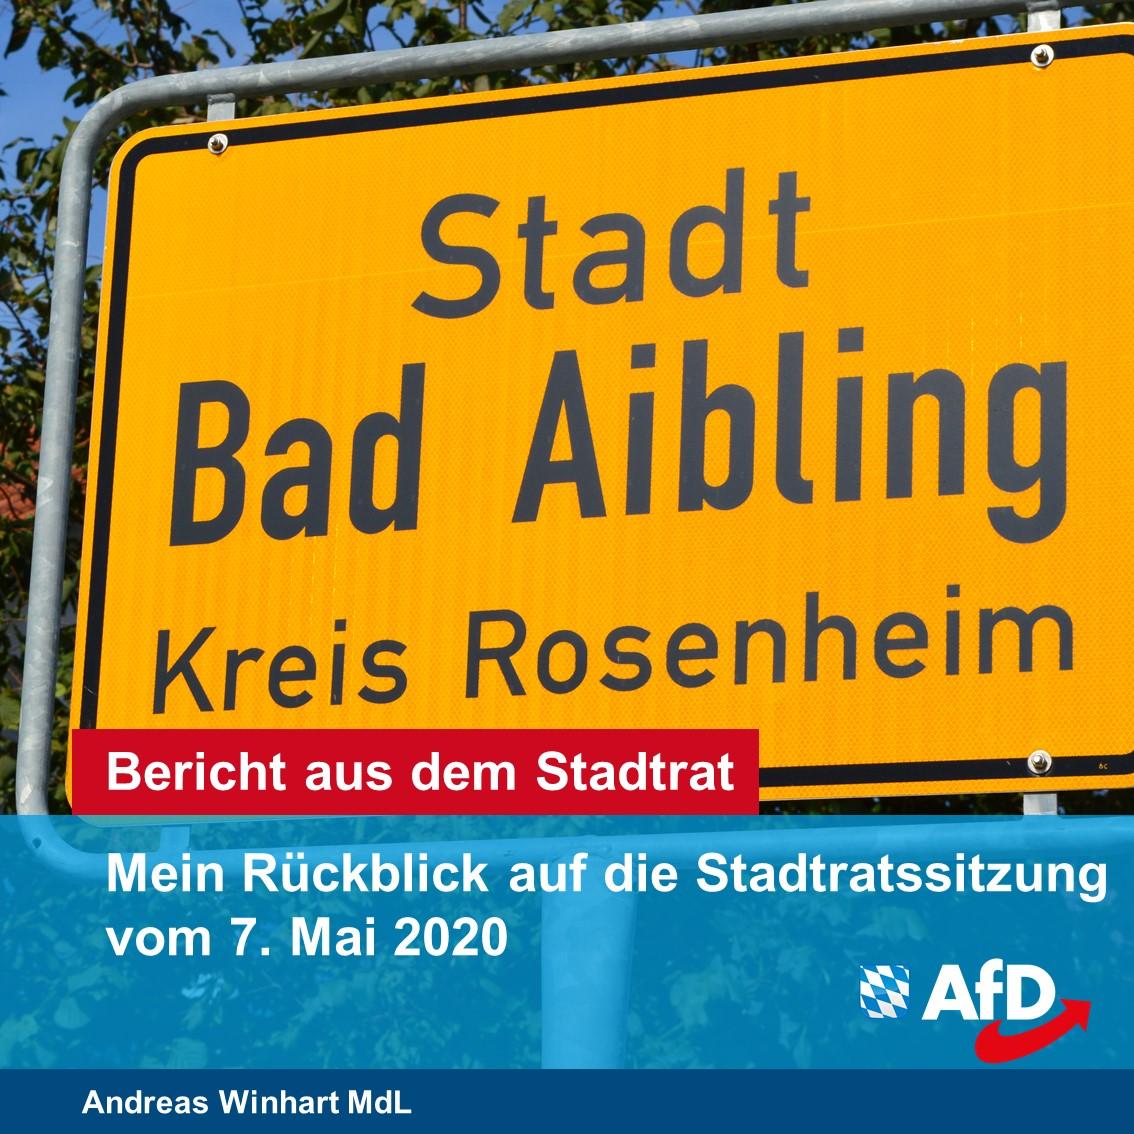 Die AfD ist im Stadtrat Bad Aibling angekommen!